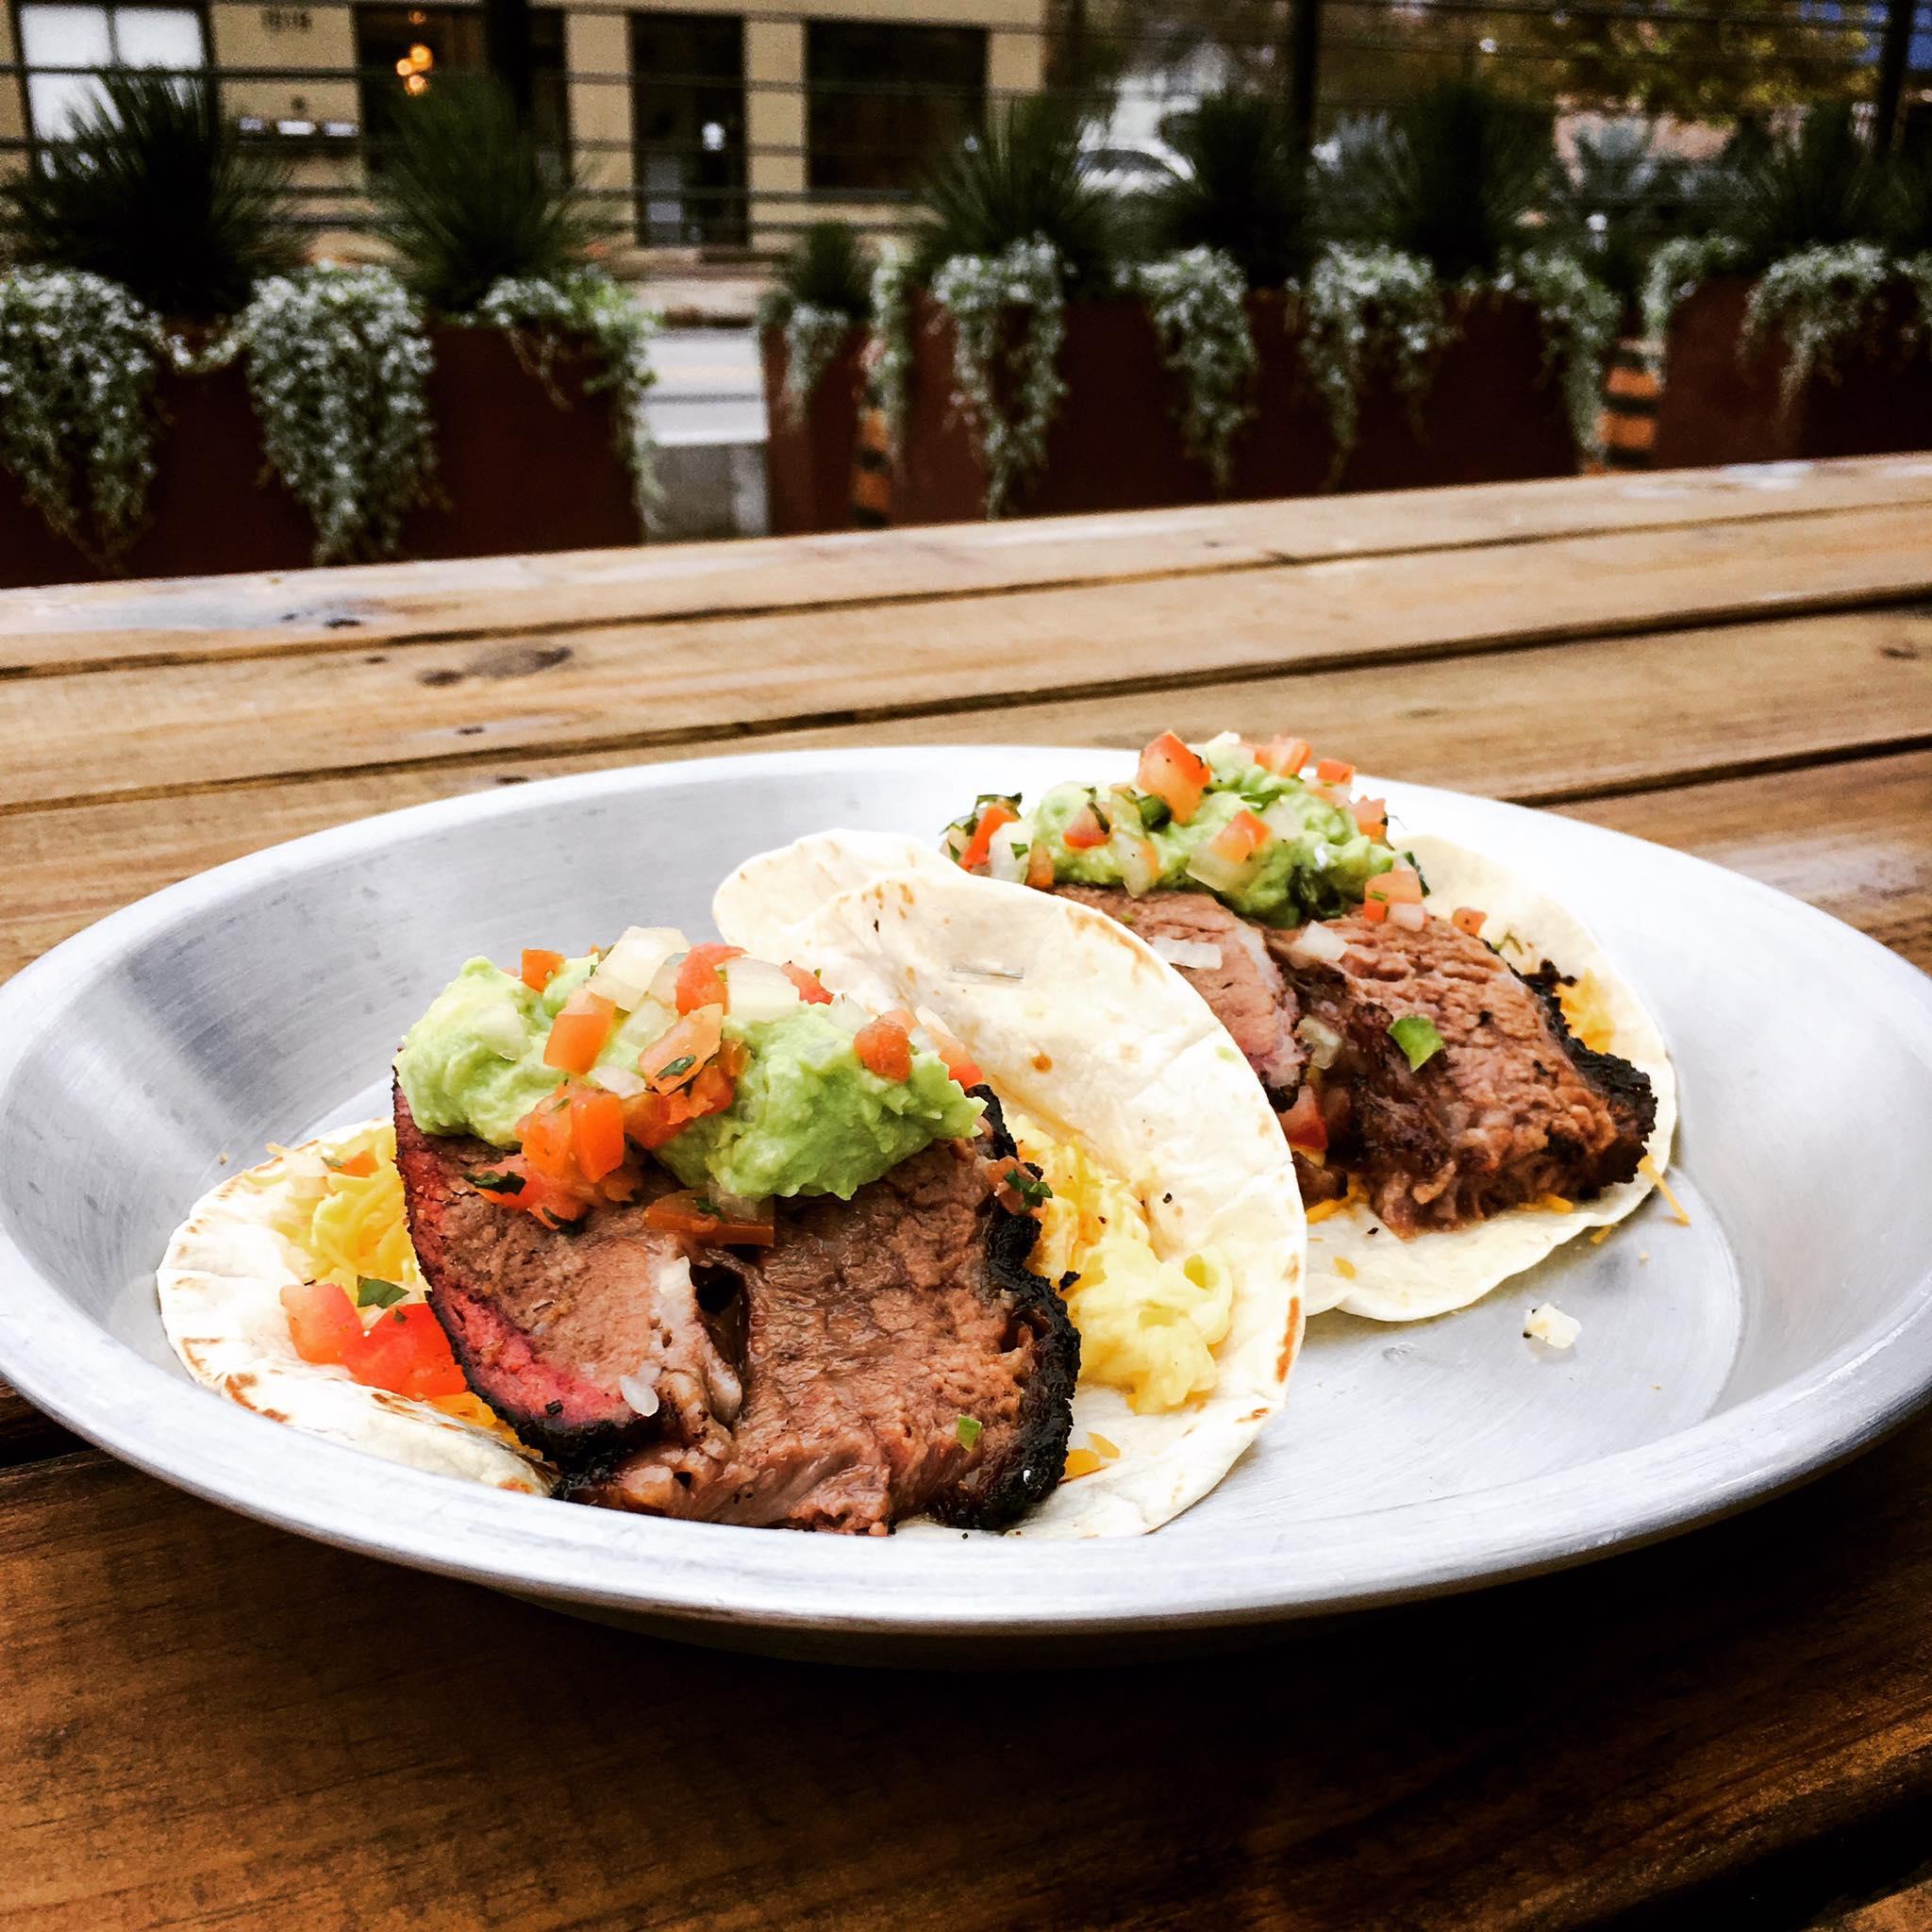 Brisket tacos from EastSide Tavern